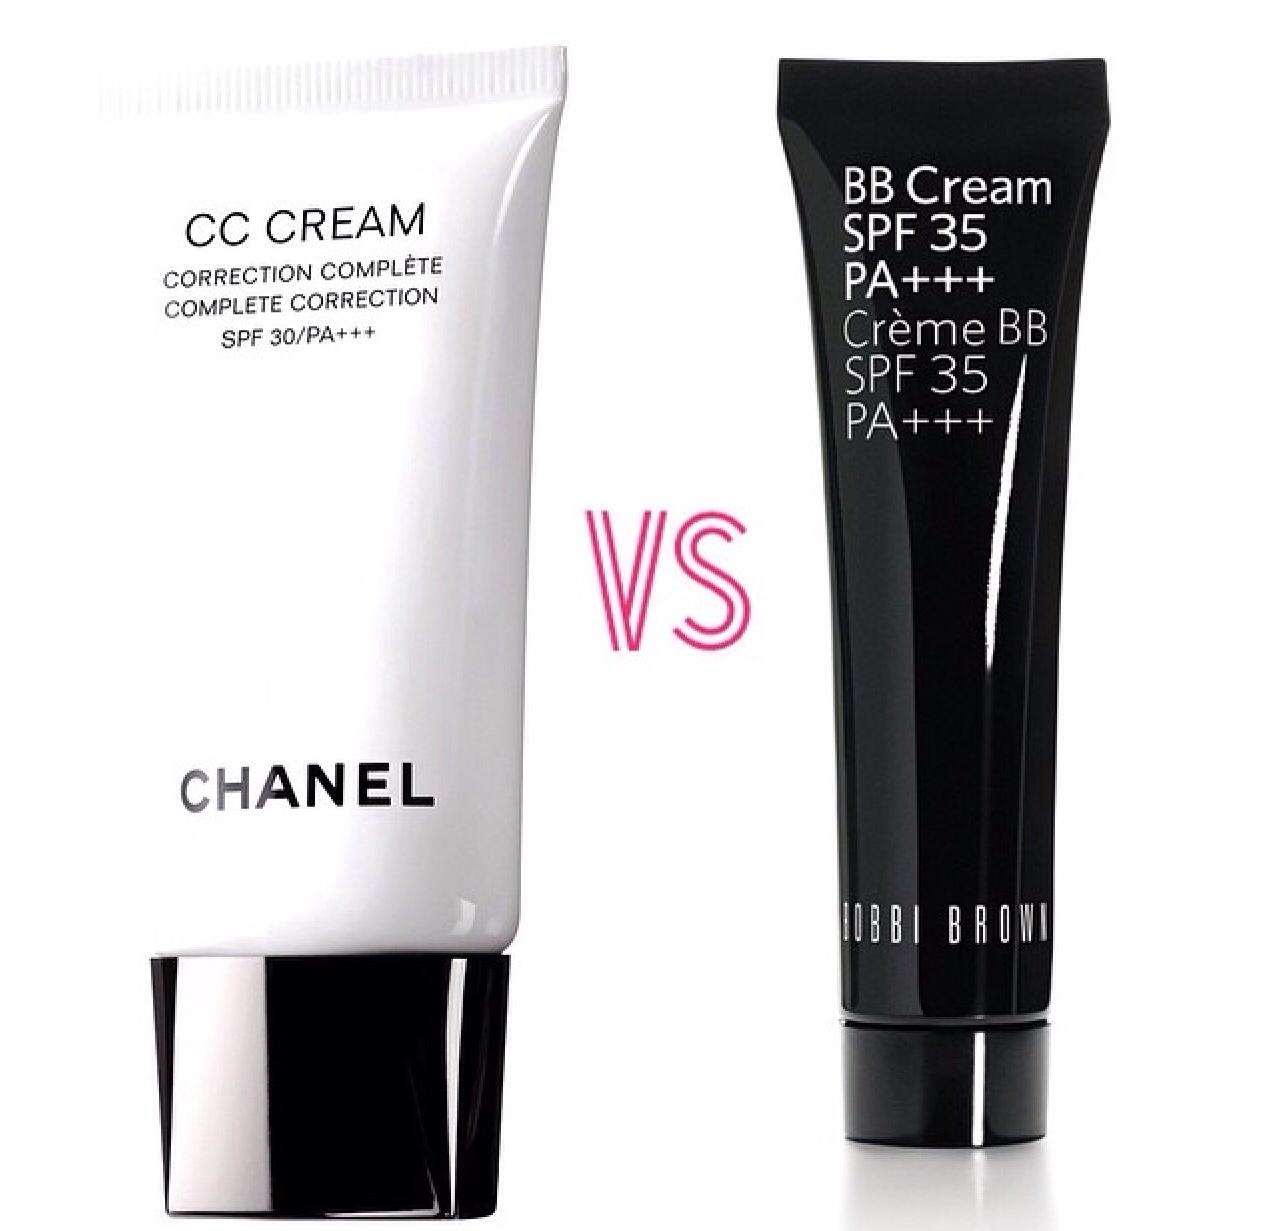 chanel cc cream vs bobbi brown bb cream modest blush. Black Bedroom Furniture Sets. Home Design Ideas